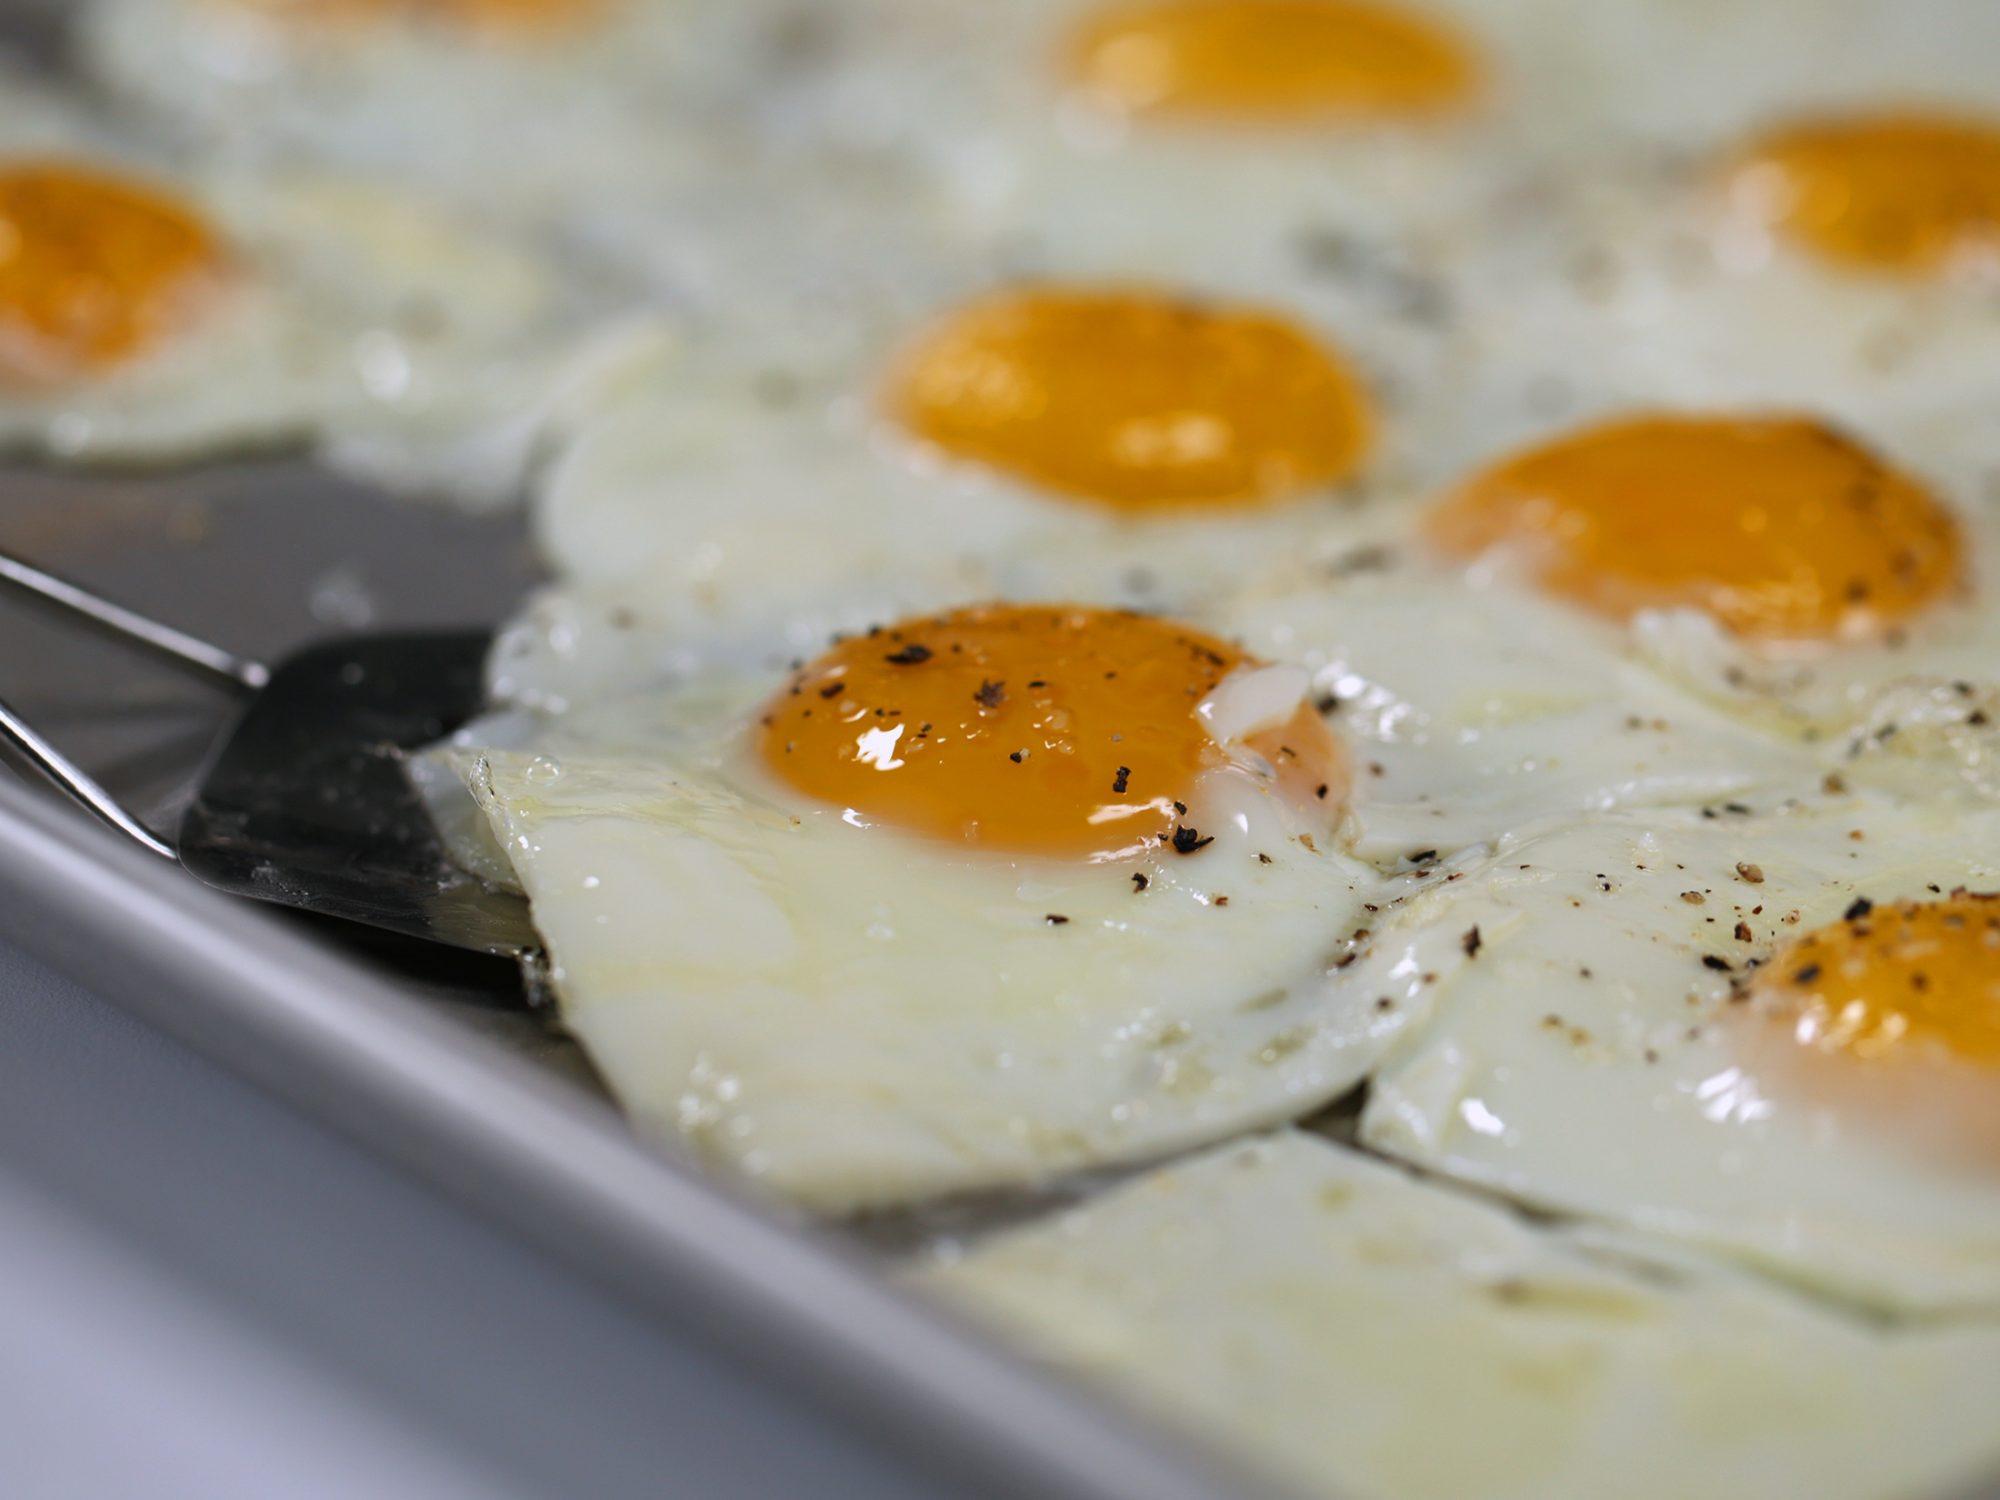 Sheet Pan Fried Eggs